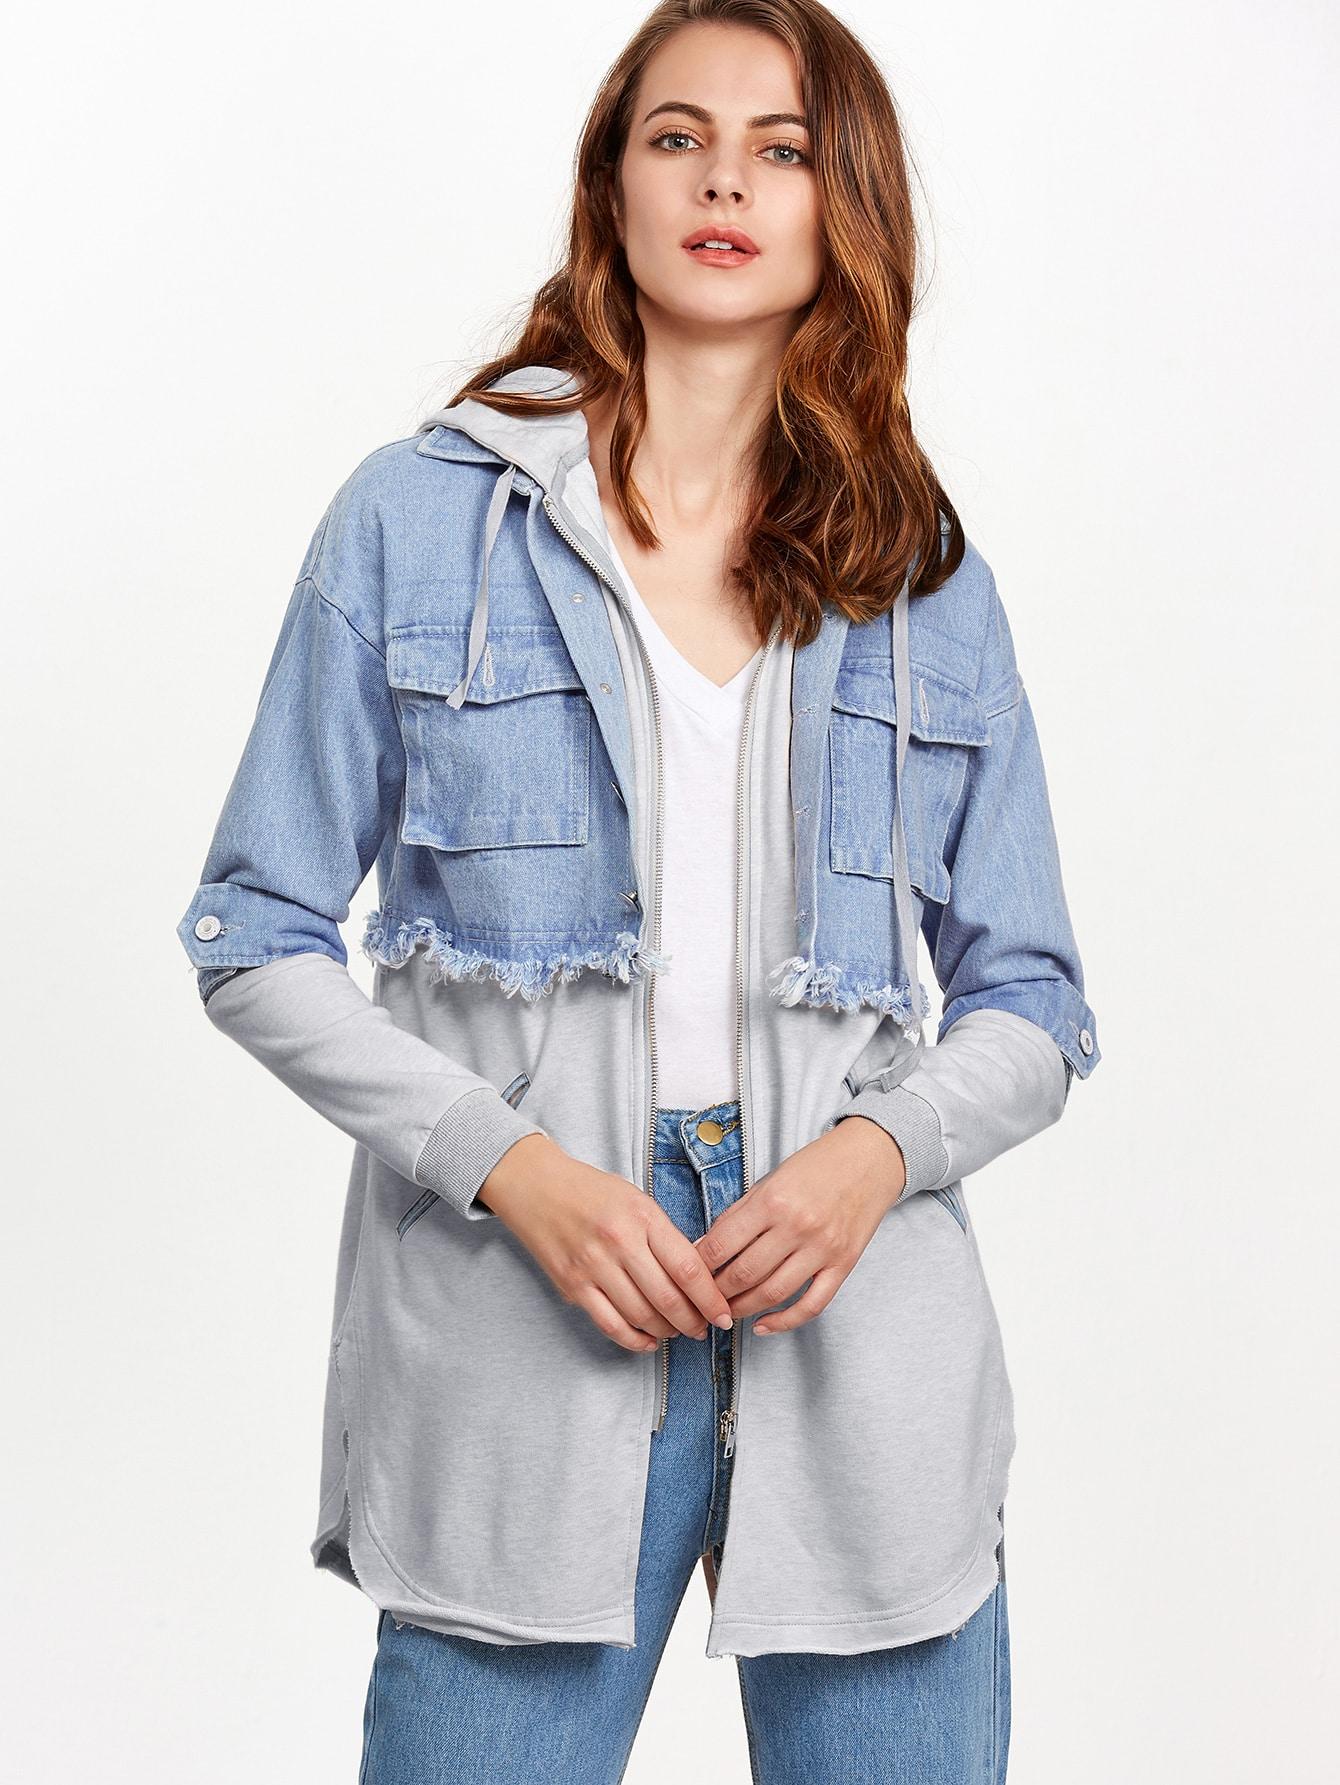 Contrast Split Back Zip Up 2 In 1 Hooded Jacket jacket161202704